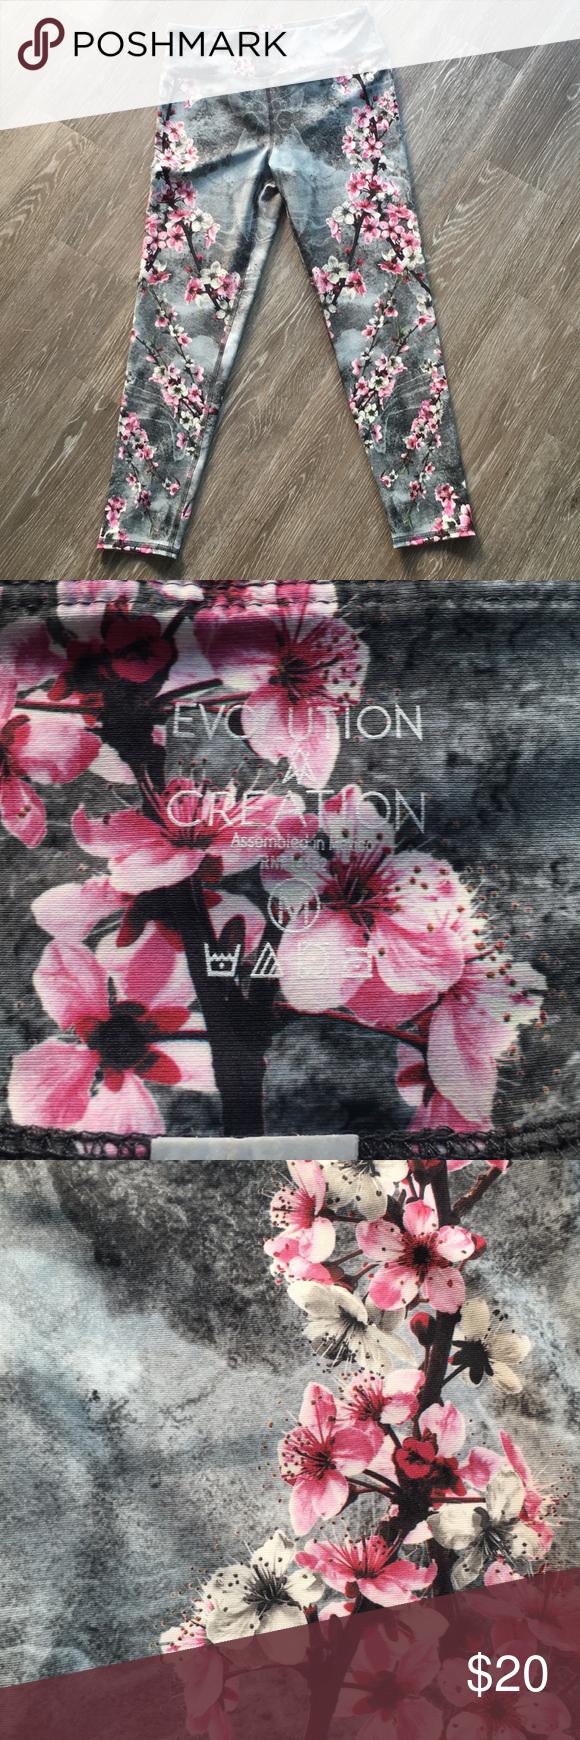 48d2fc9e5febc 🎉Evolution Creation EvCr Cherry Blossom Leggings Brand new, worn once.  Medium Evolution and